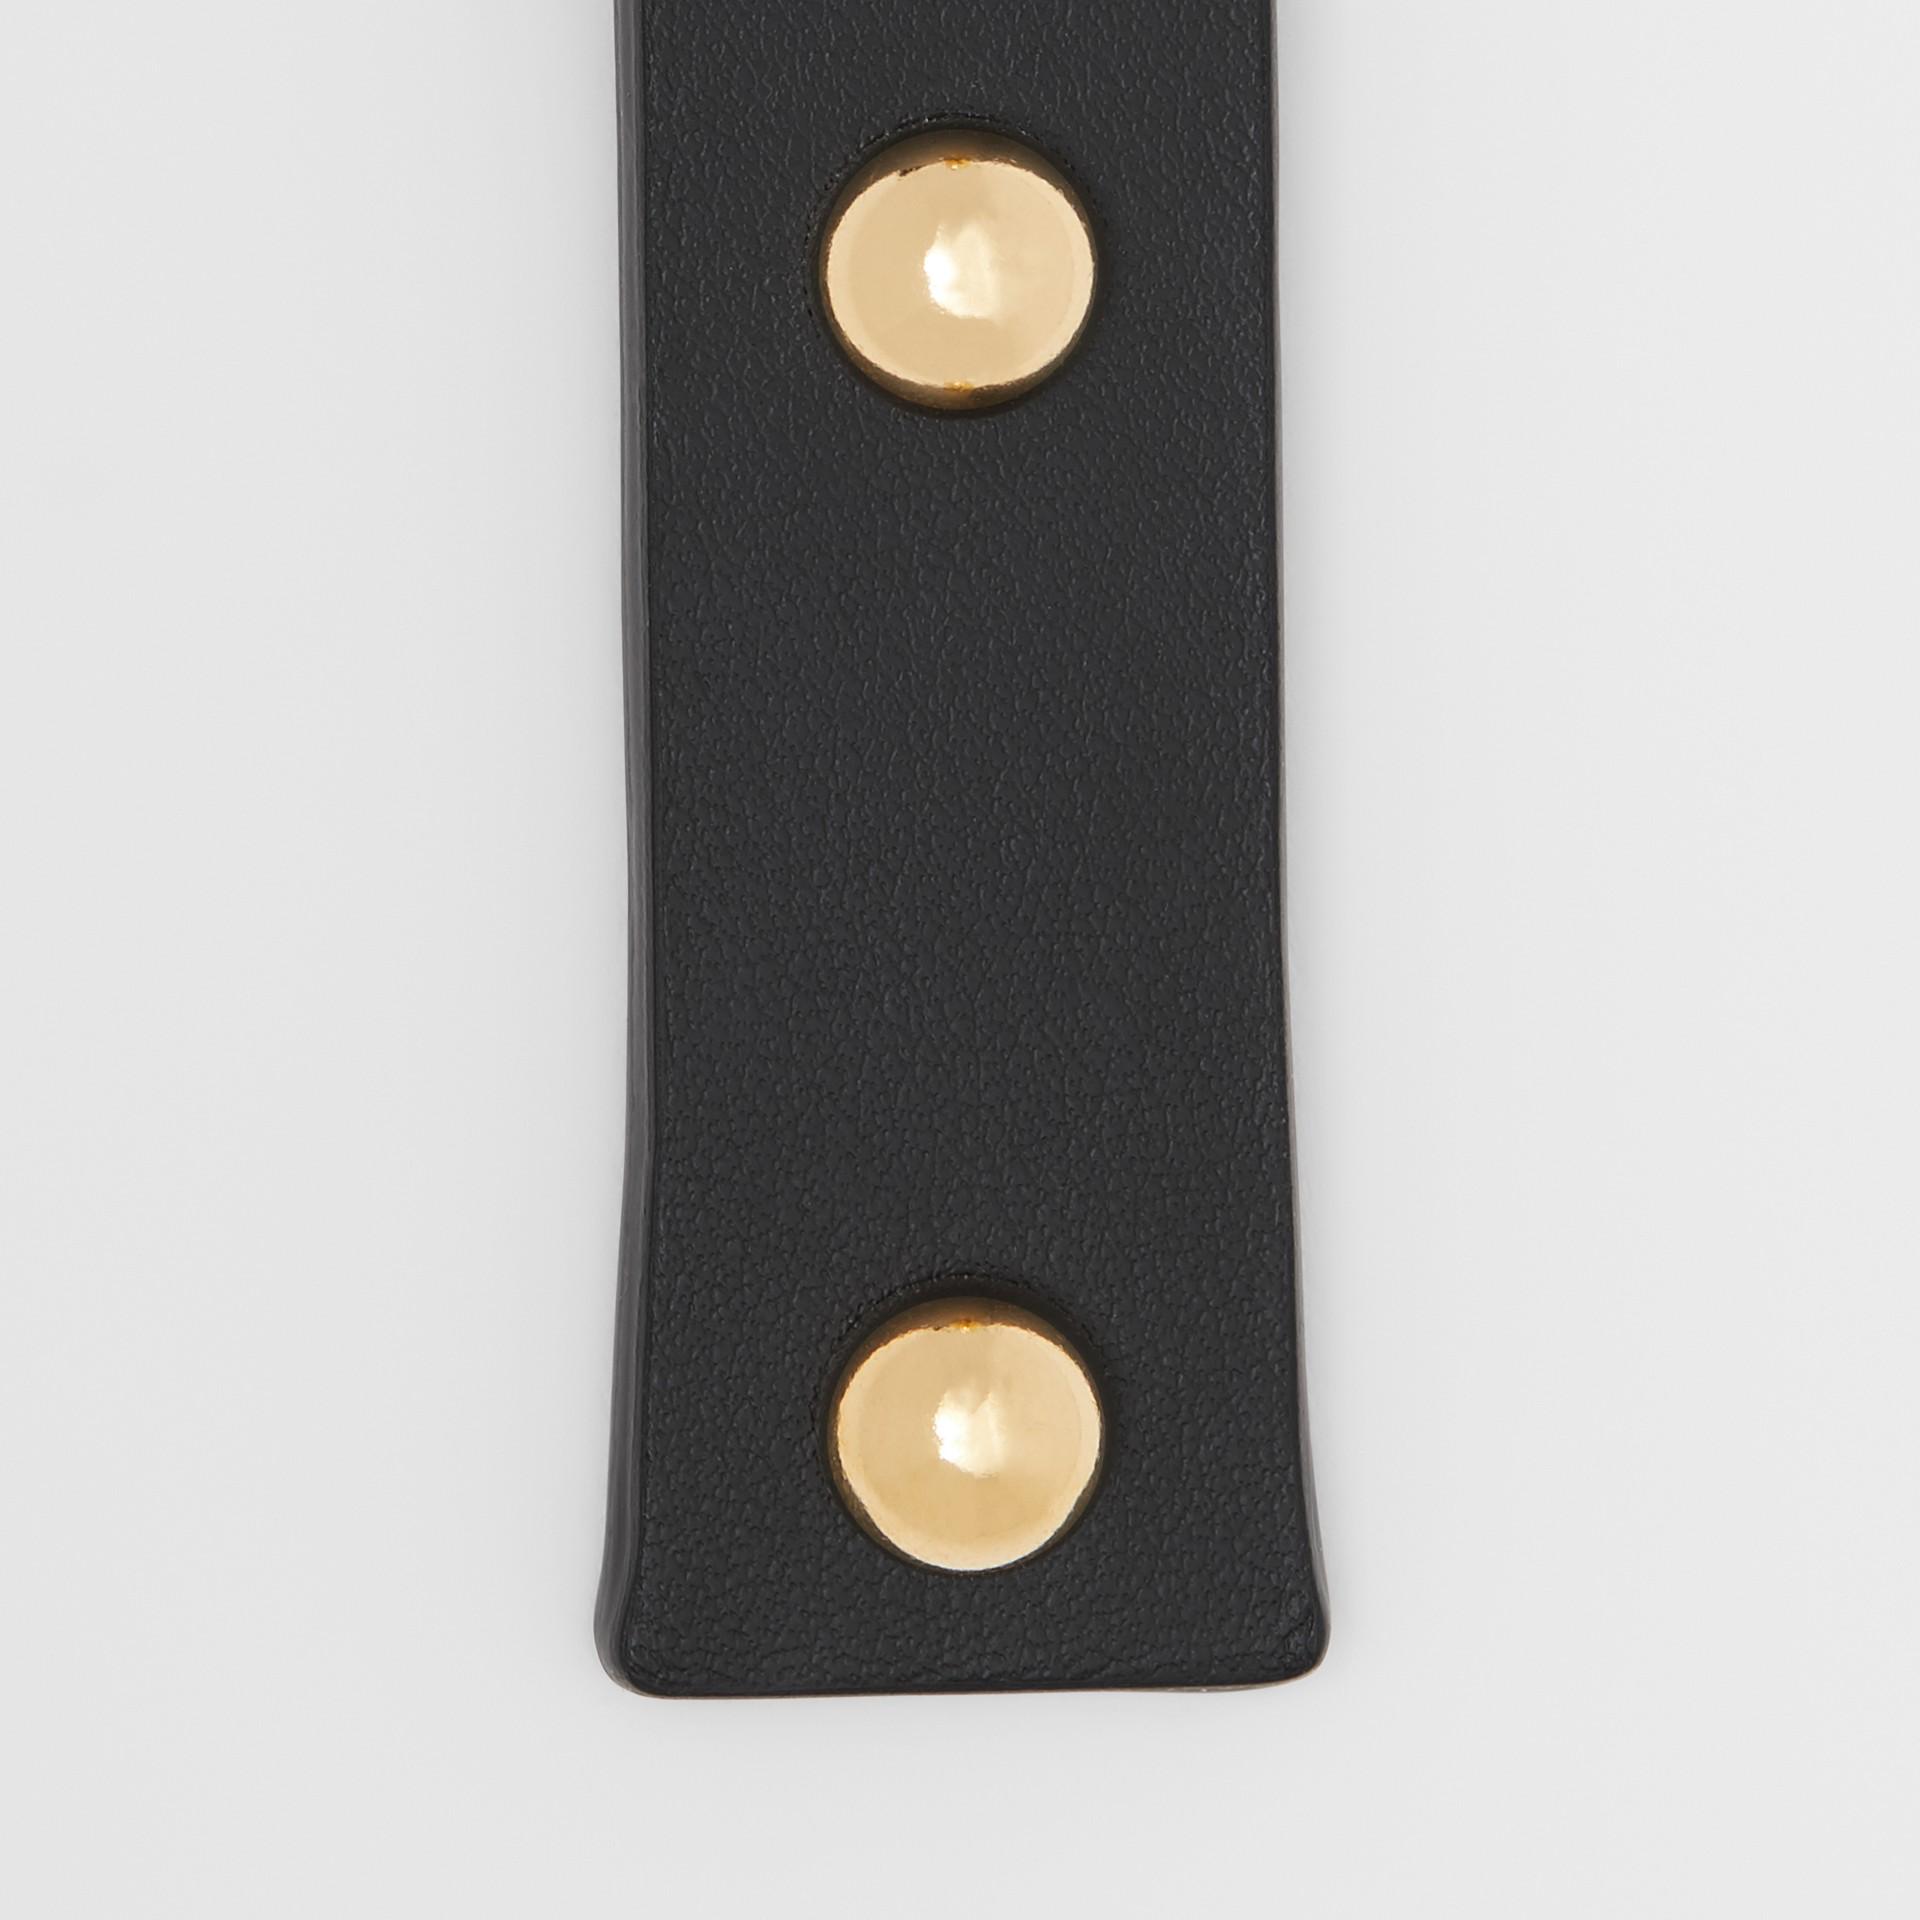 「I」鉚釘皮革字母吊飾 (黑色/淺金色) - 女款 | Burberry - 圖庫照片 1